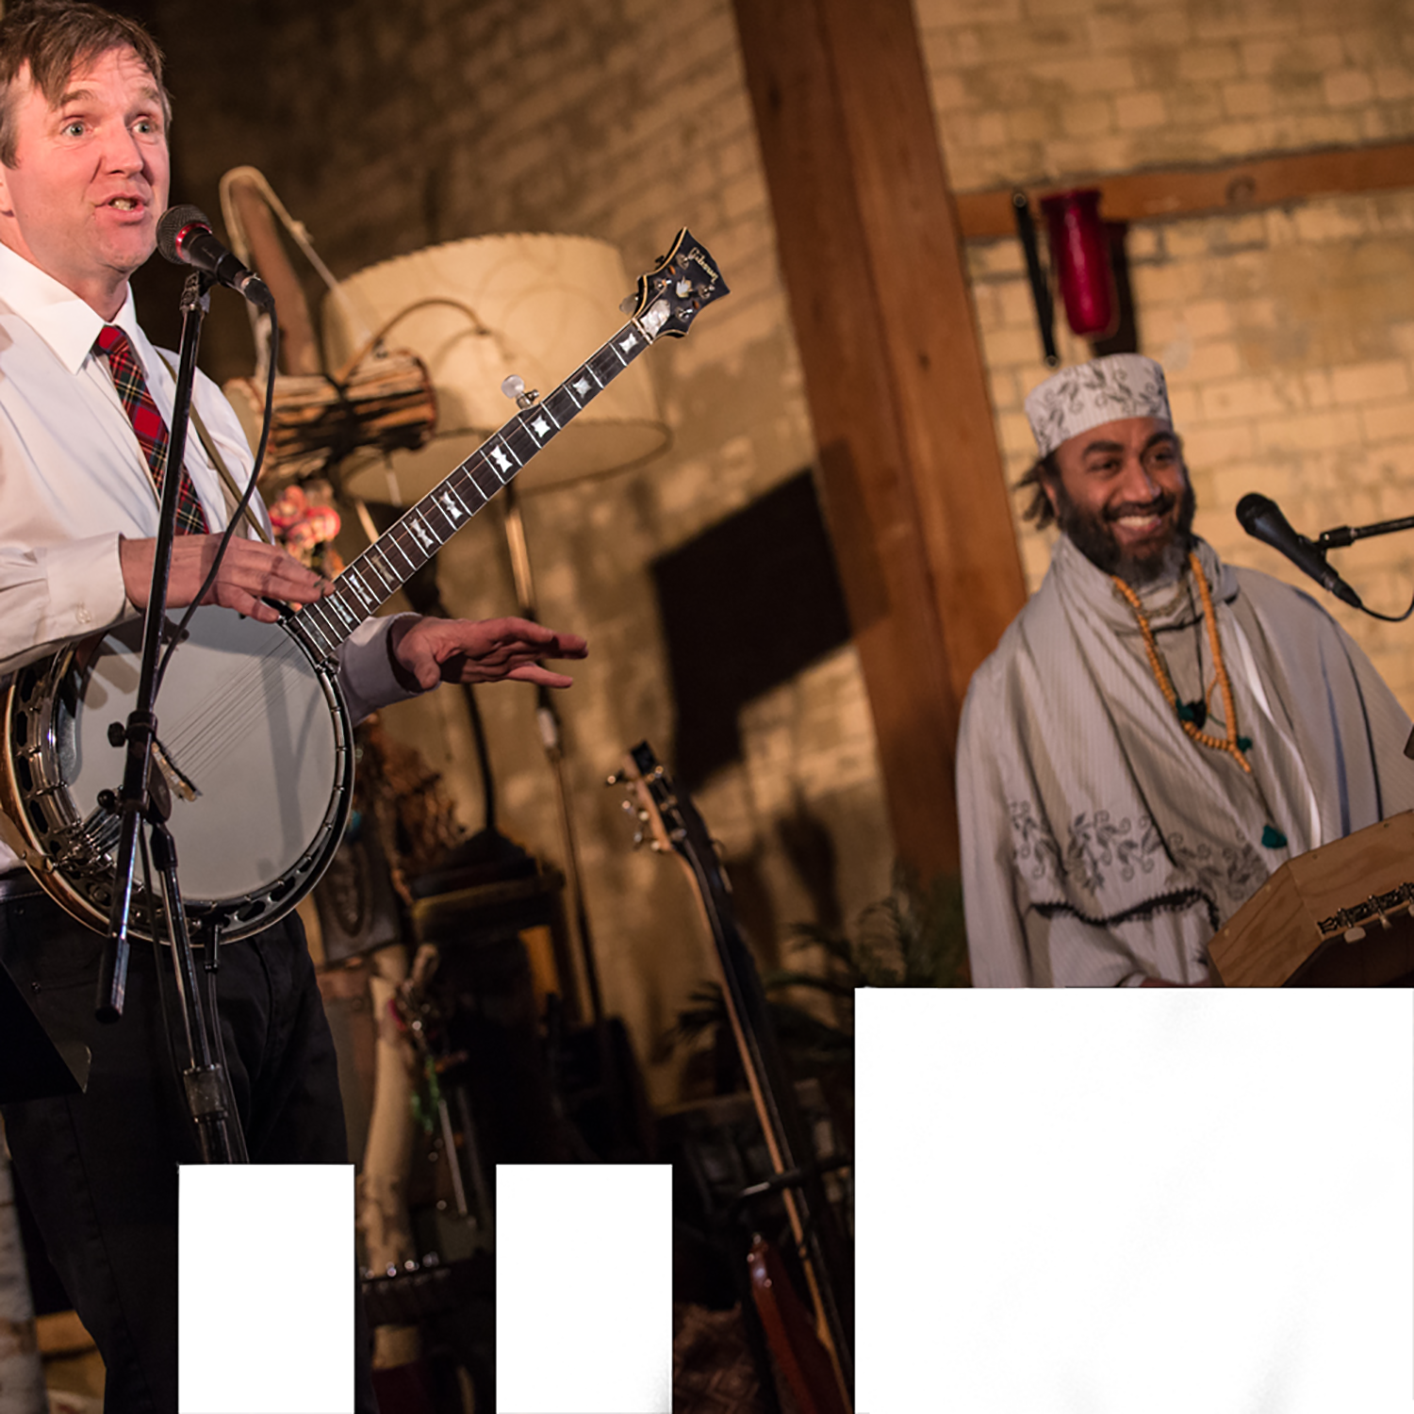 Photo of John Millard and Waleed Abdulhamid performing on stage